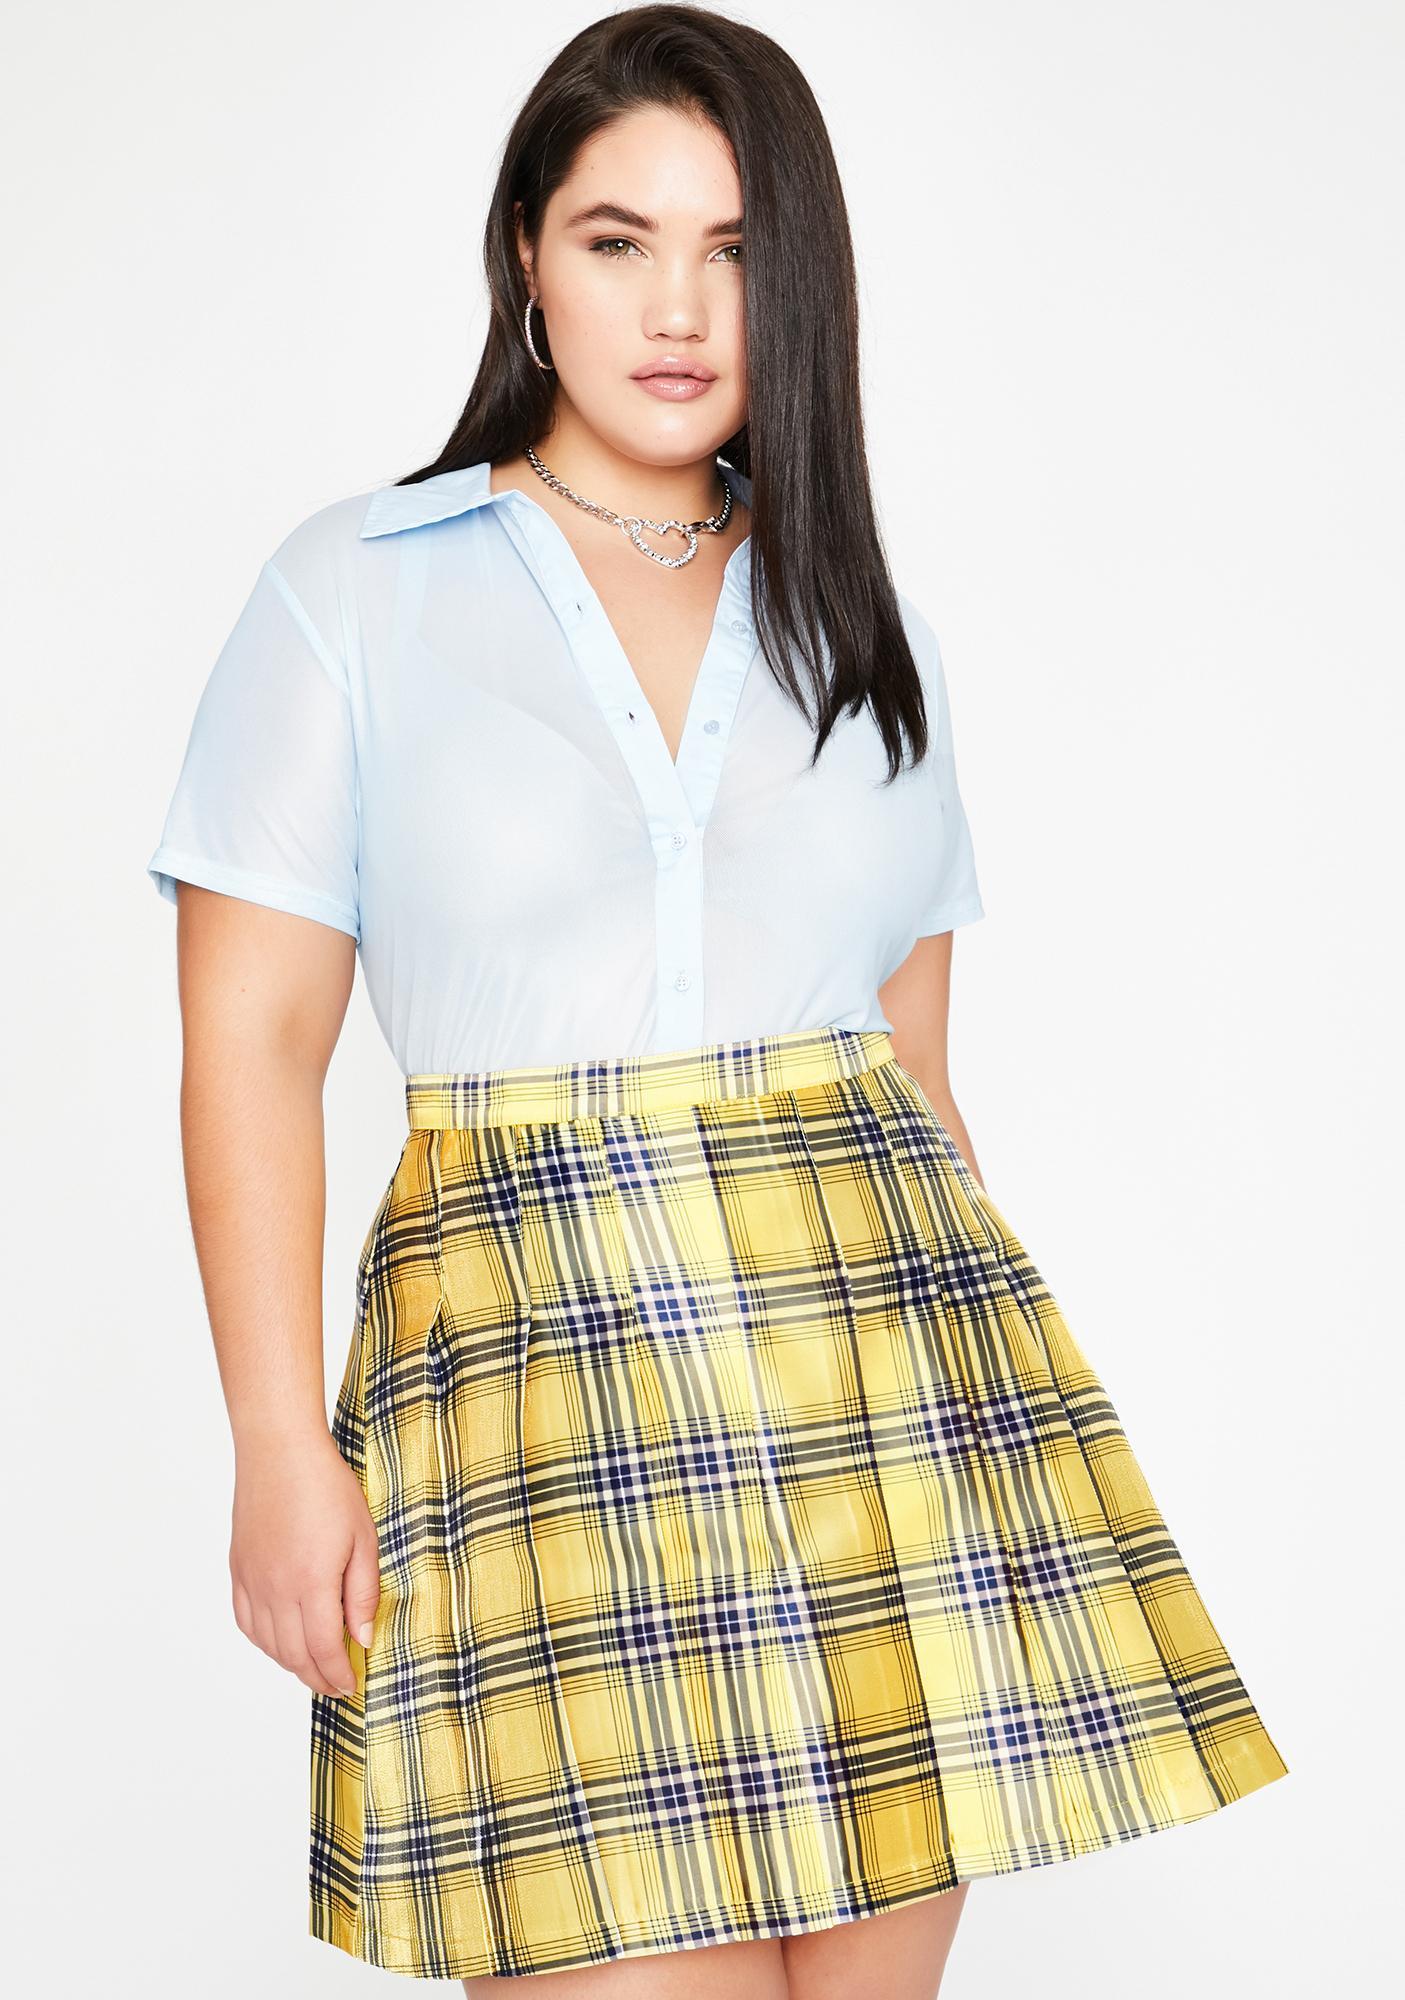 Sugar Thrillz Best Frenemies Forever Plaid Skirt